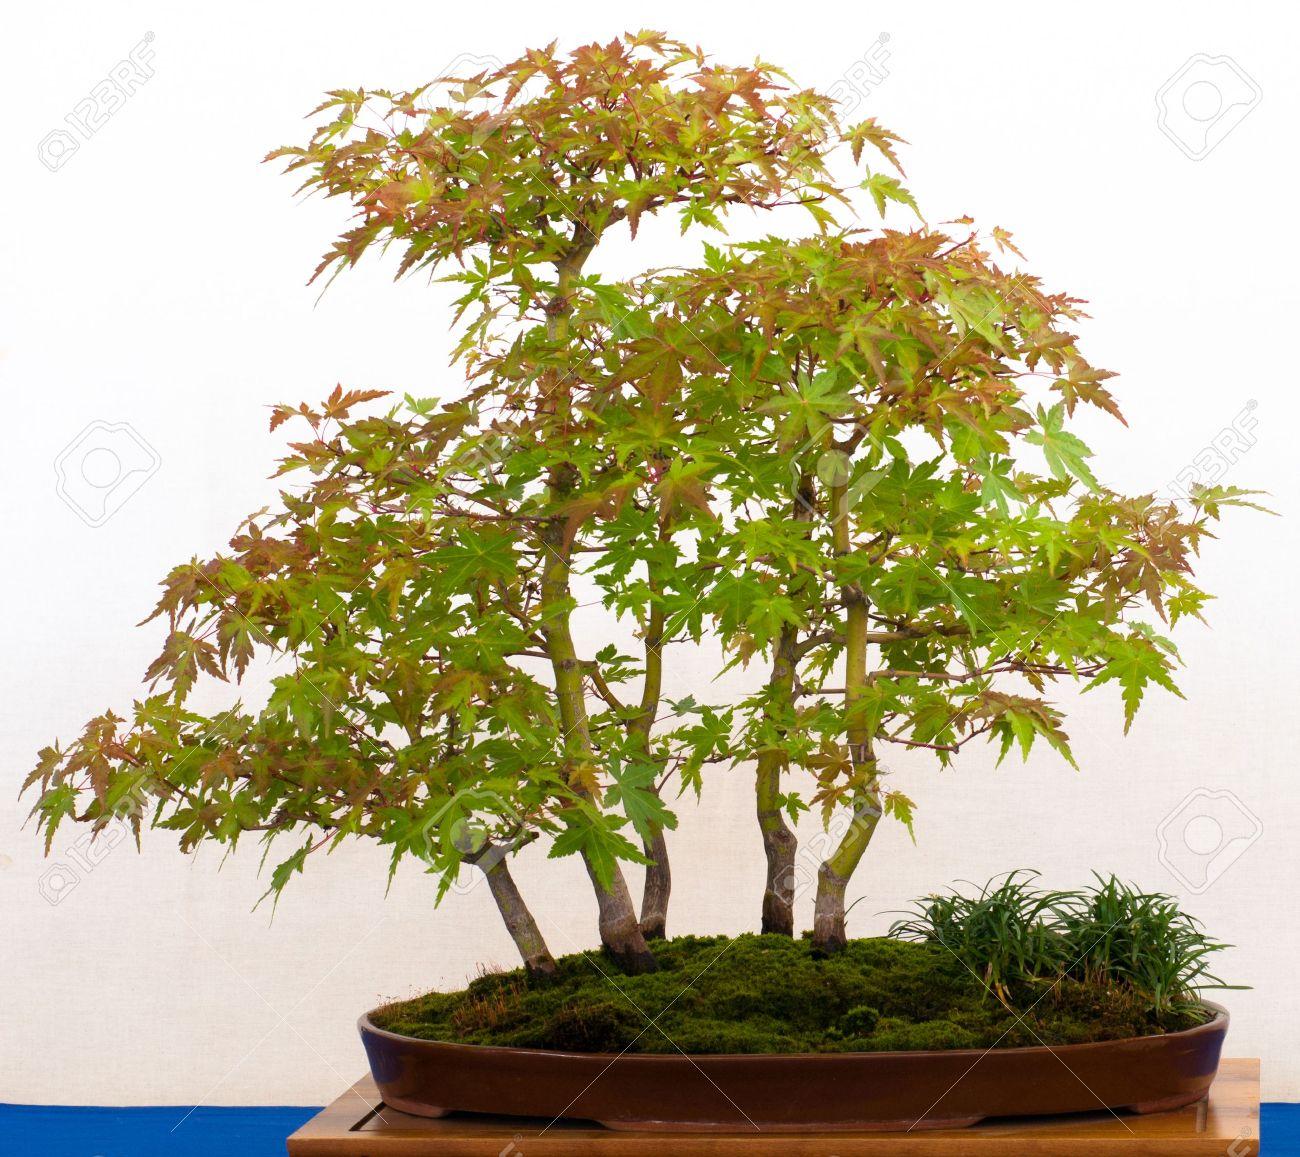 Japnaese árboles De Arce Acer Palmatum Como Bonsai Bosque En Una